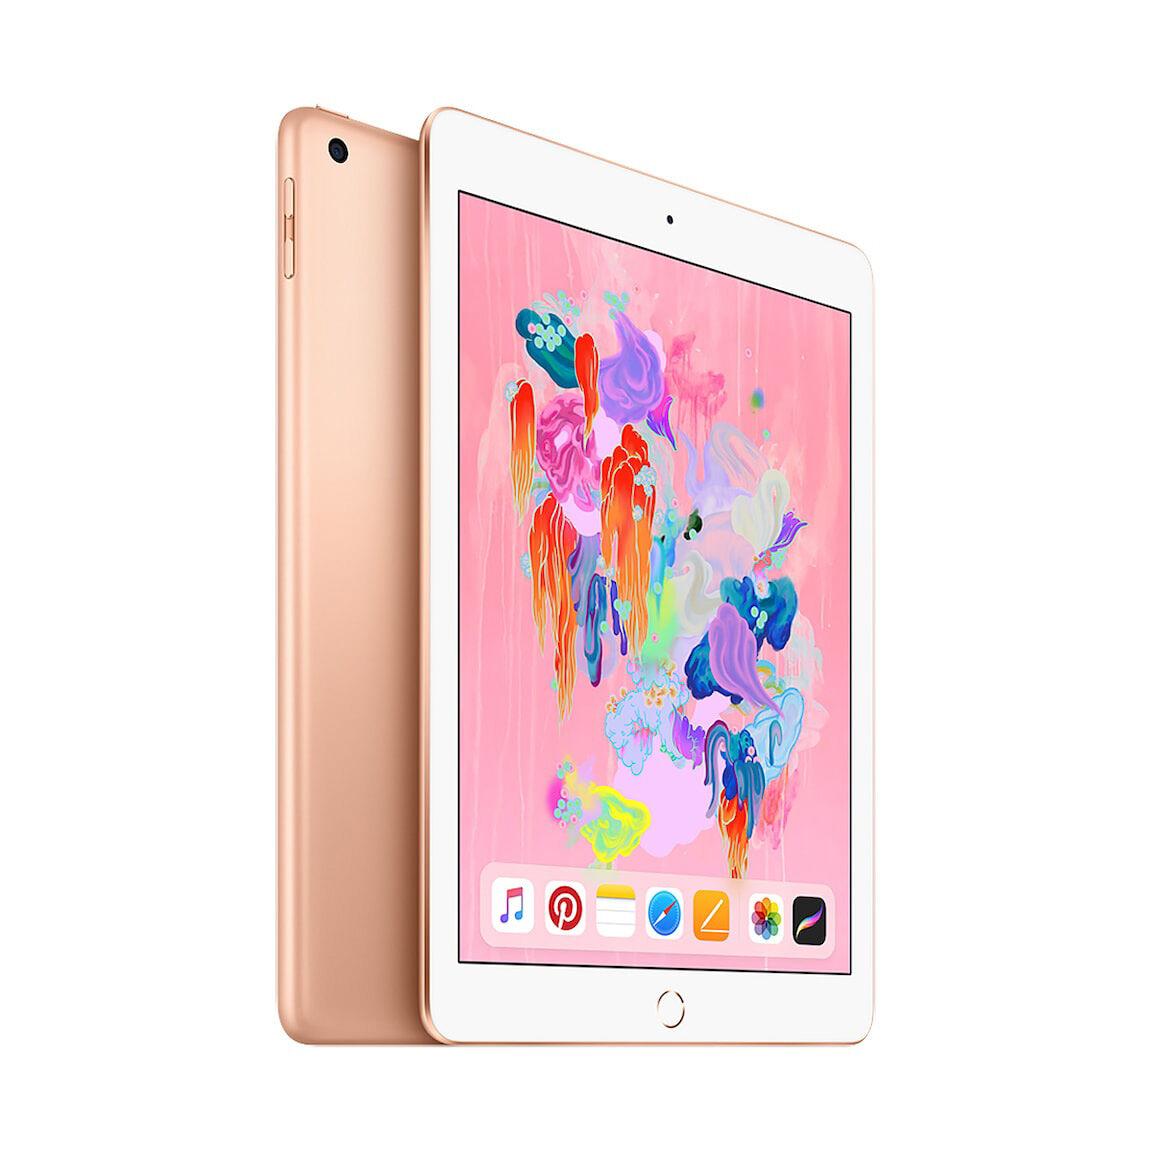 Mobilverkstedet.no Apple iPad 6 Refurbished (2018) Wifi